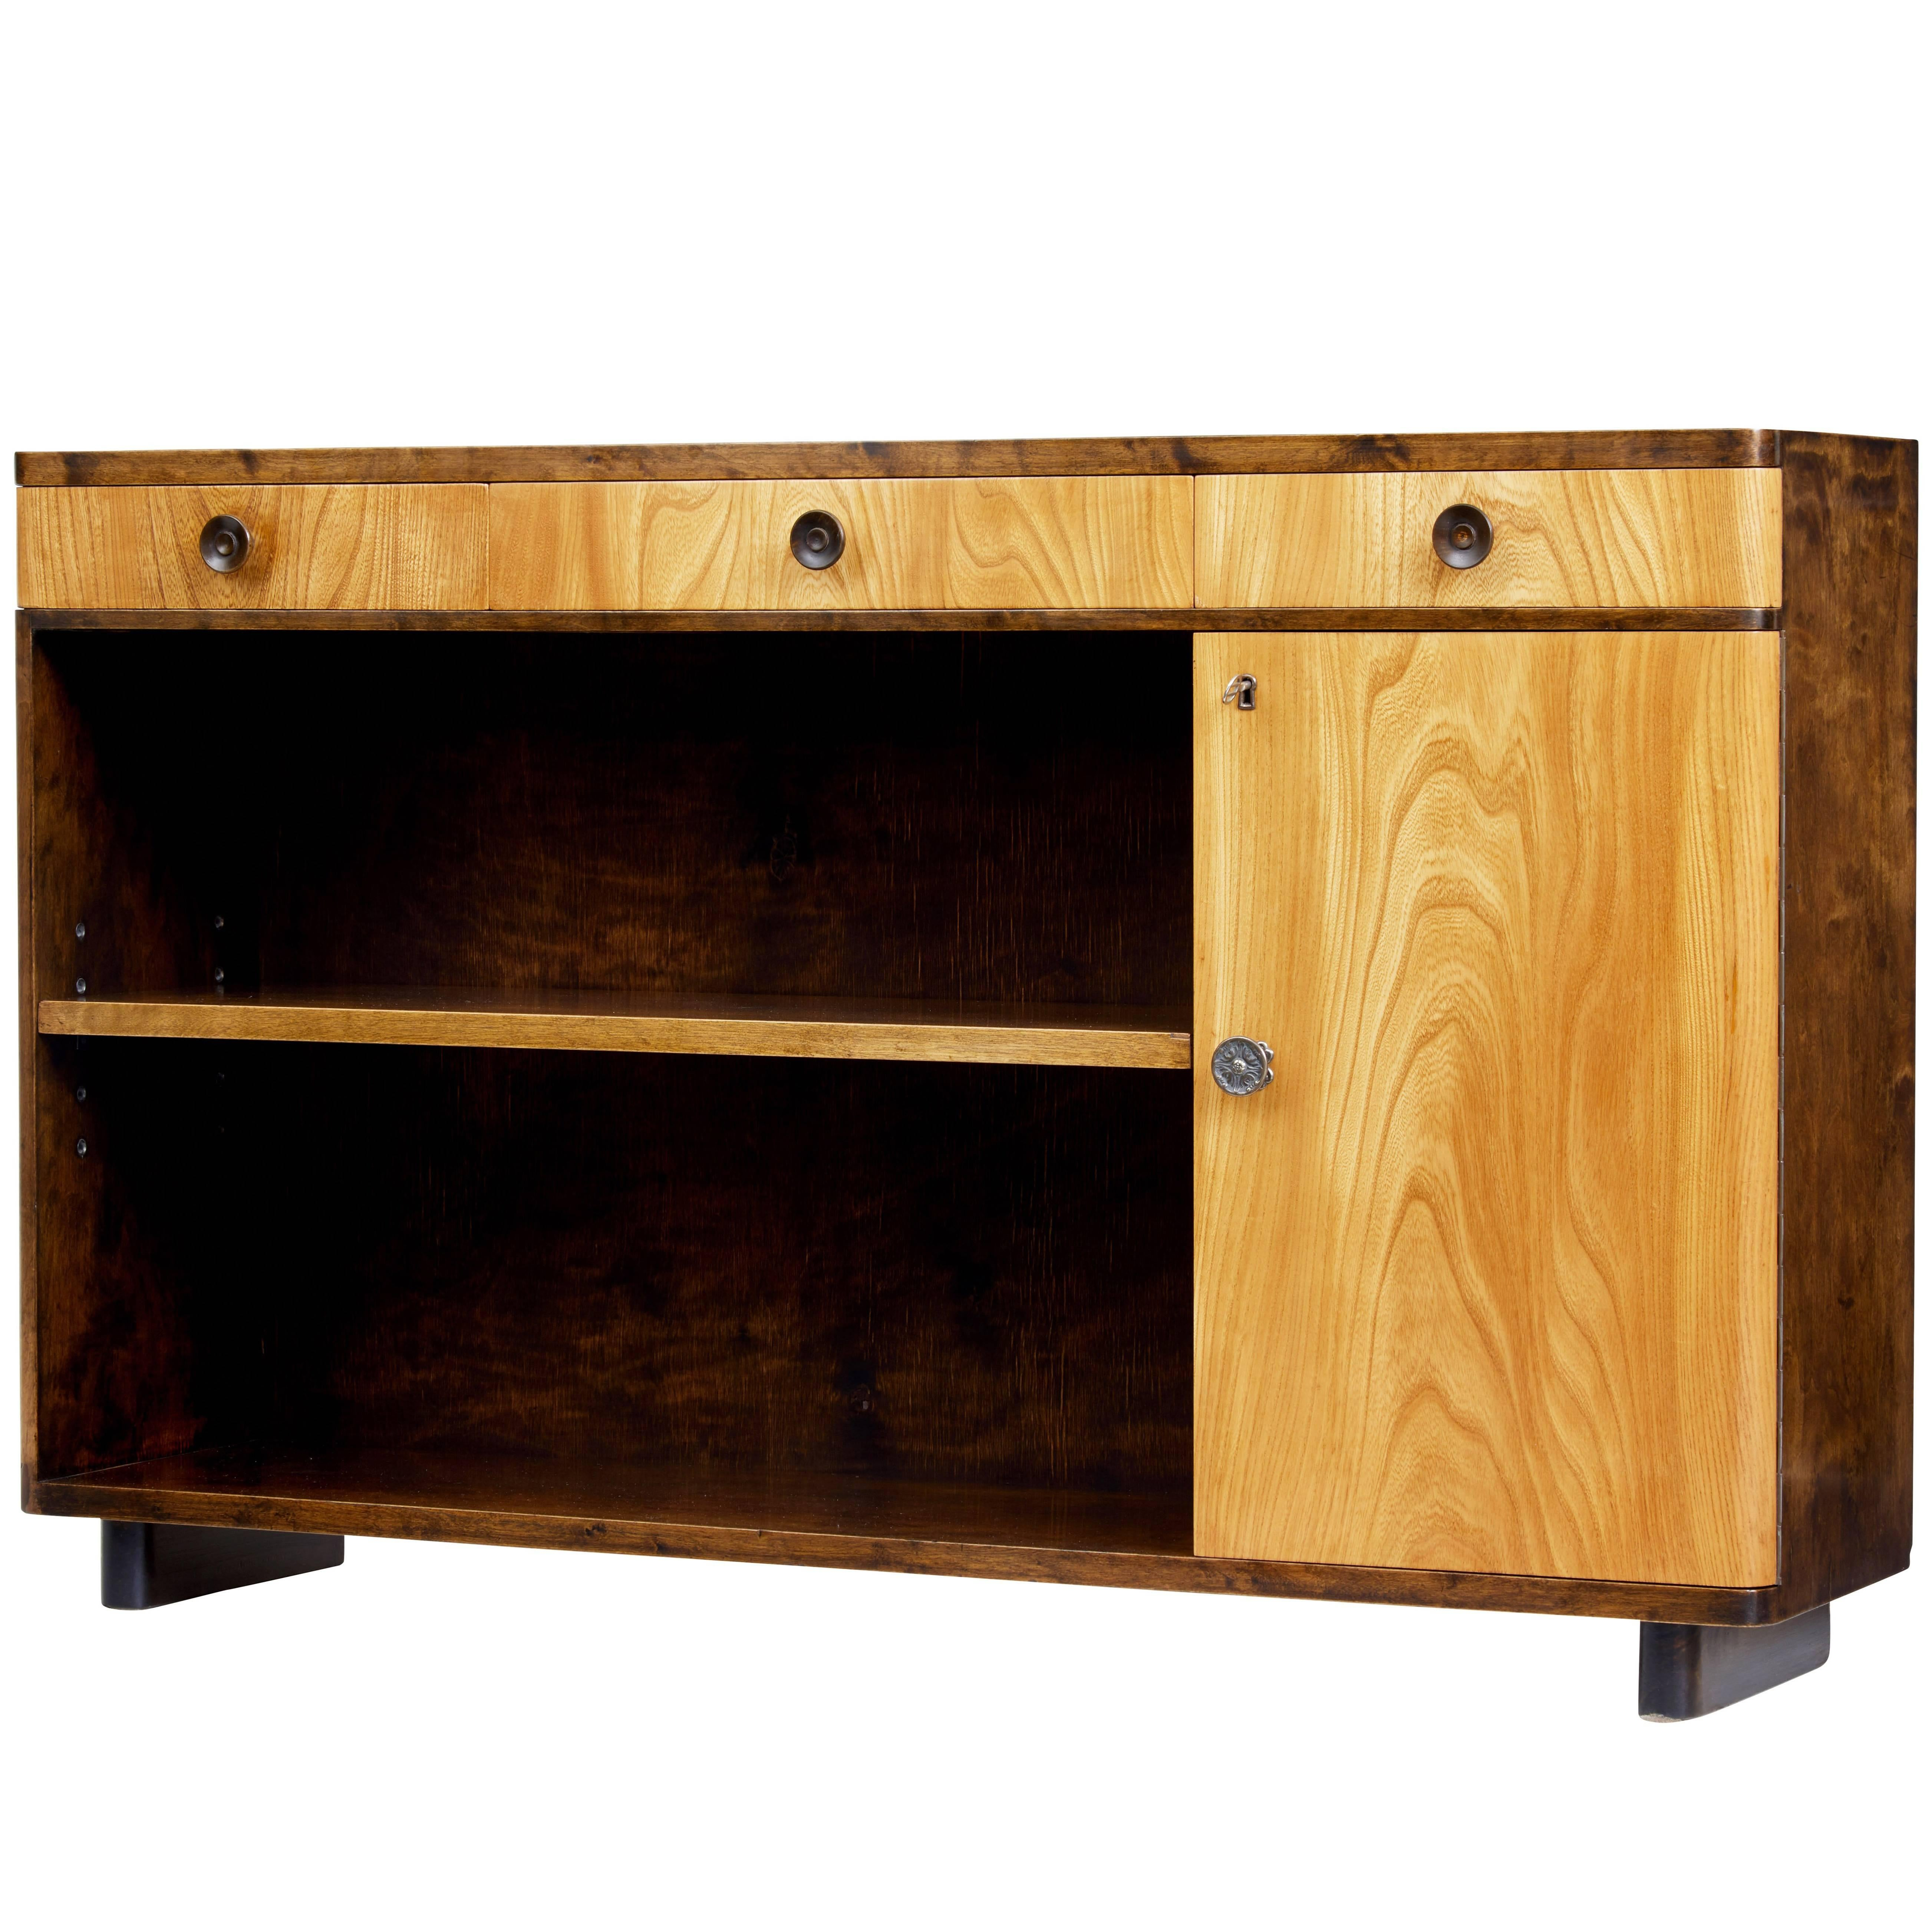 Fine Mid 20th Century Scandinavian Elm And Birch Low Bookcase